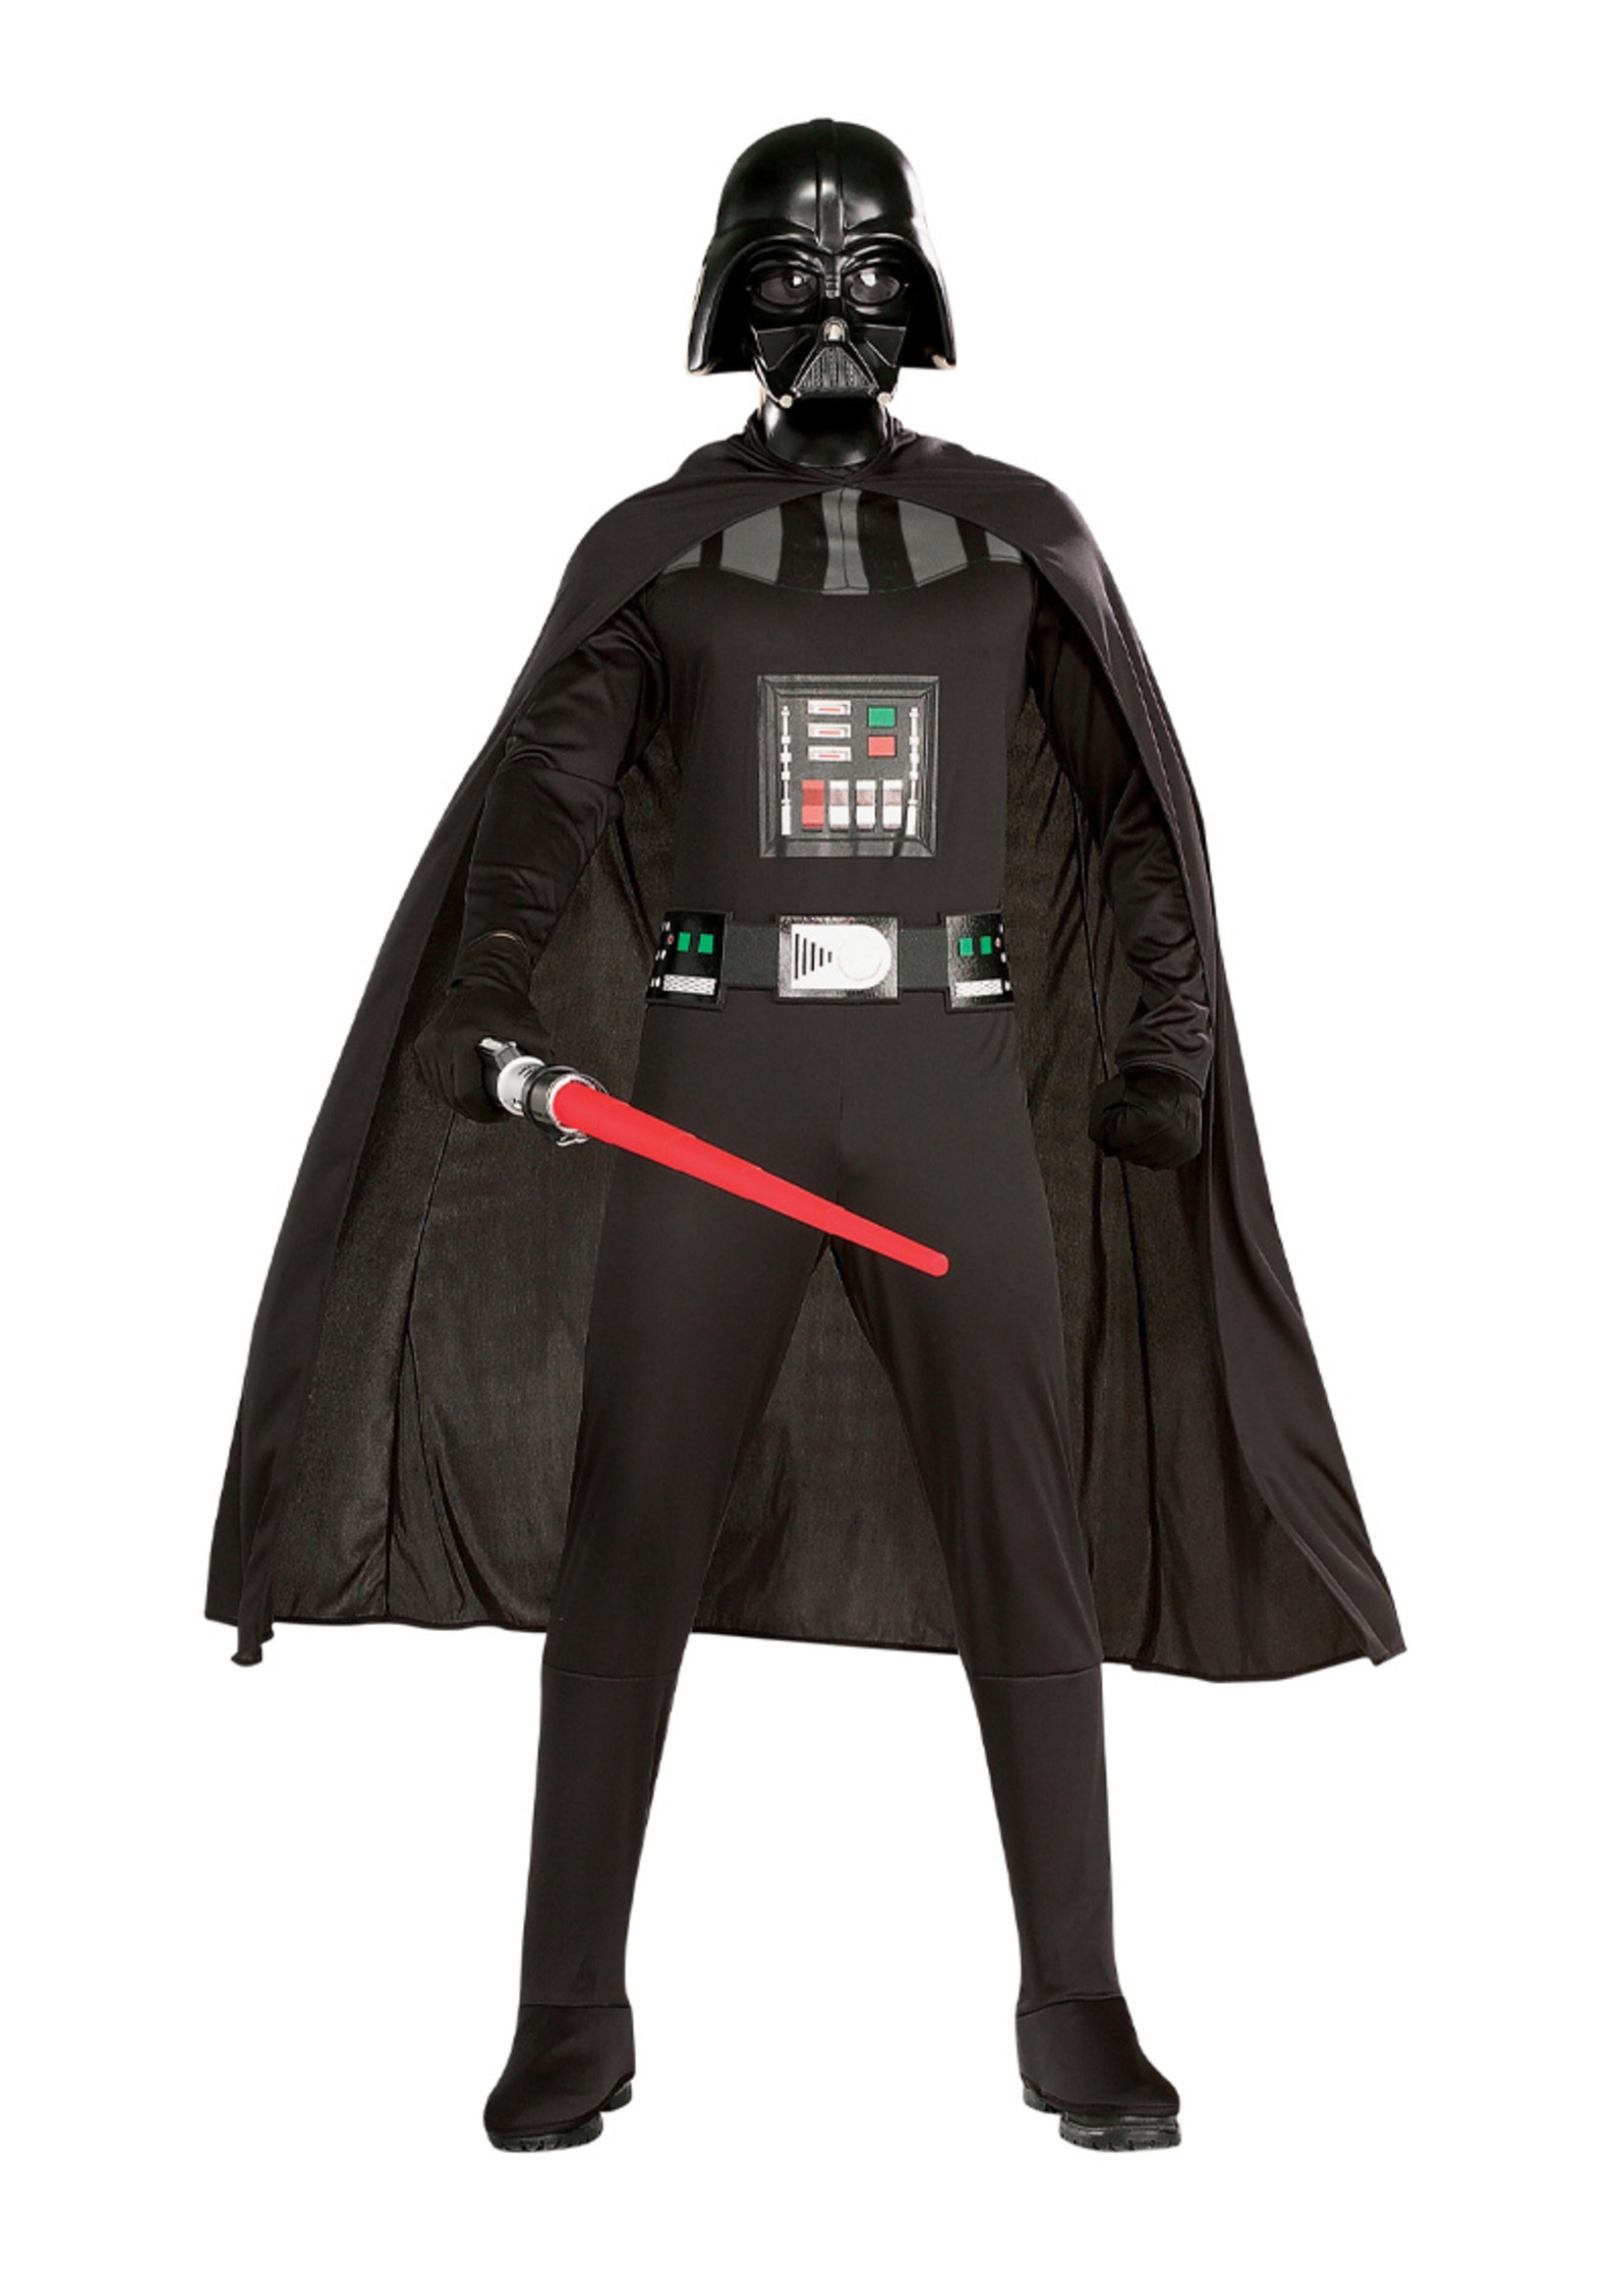 Darth Vader Costume - Men's